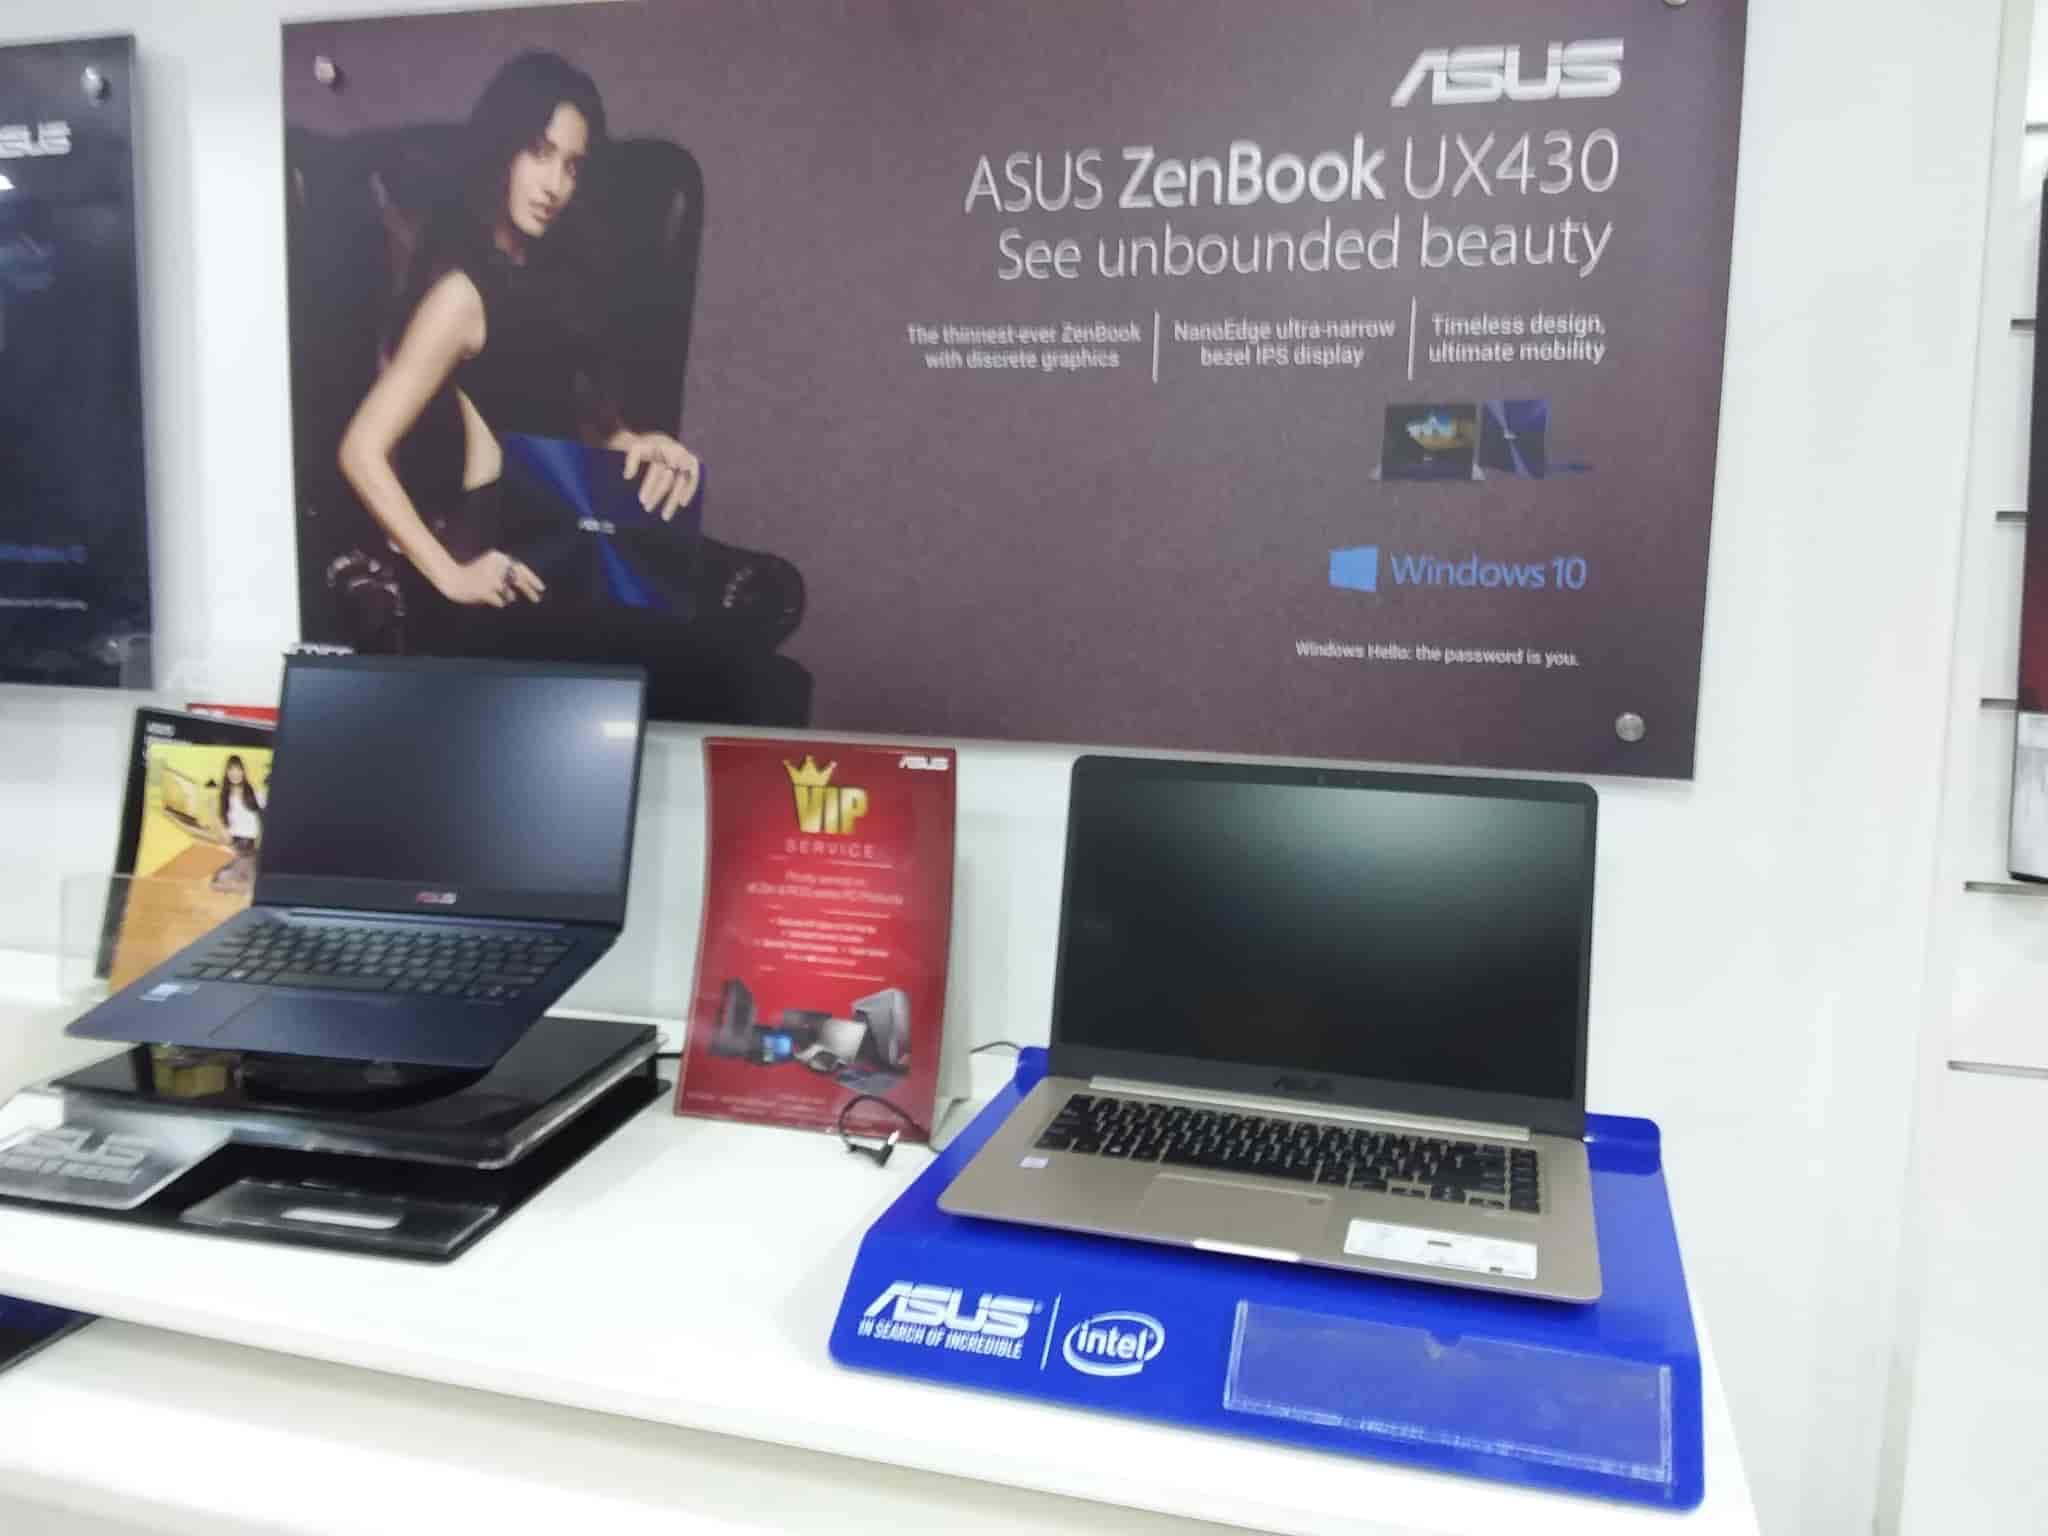 Hari Priya Computers, Vastrapur - Laptop Dealers-Asus in